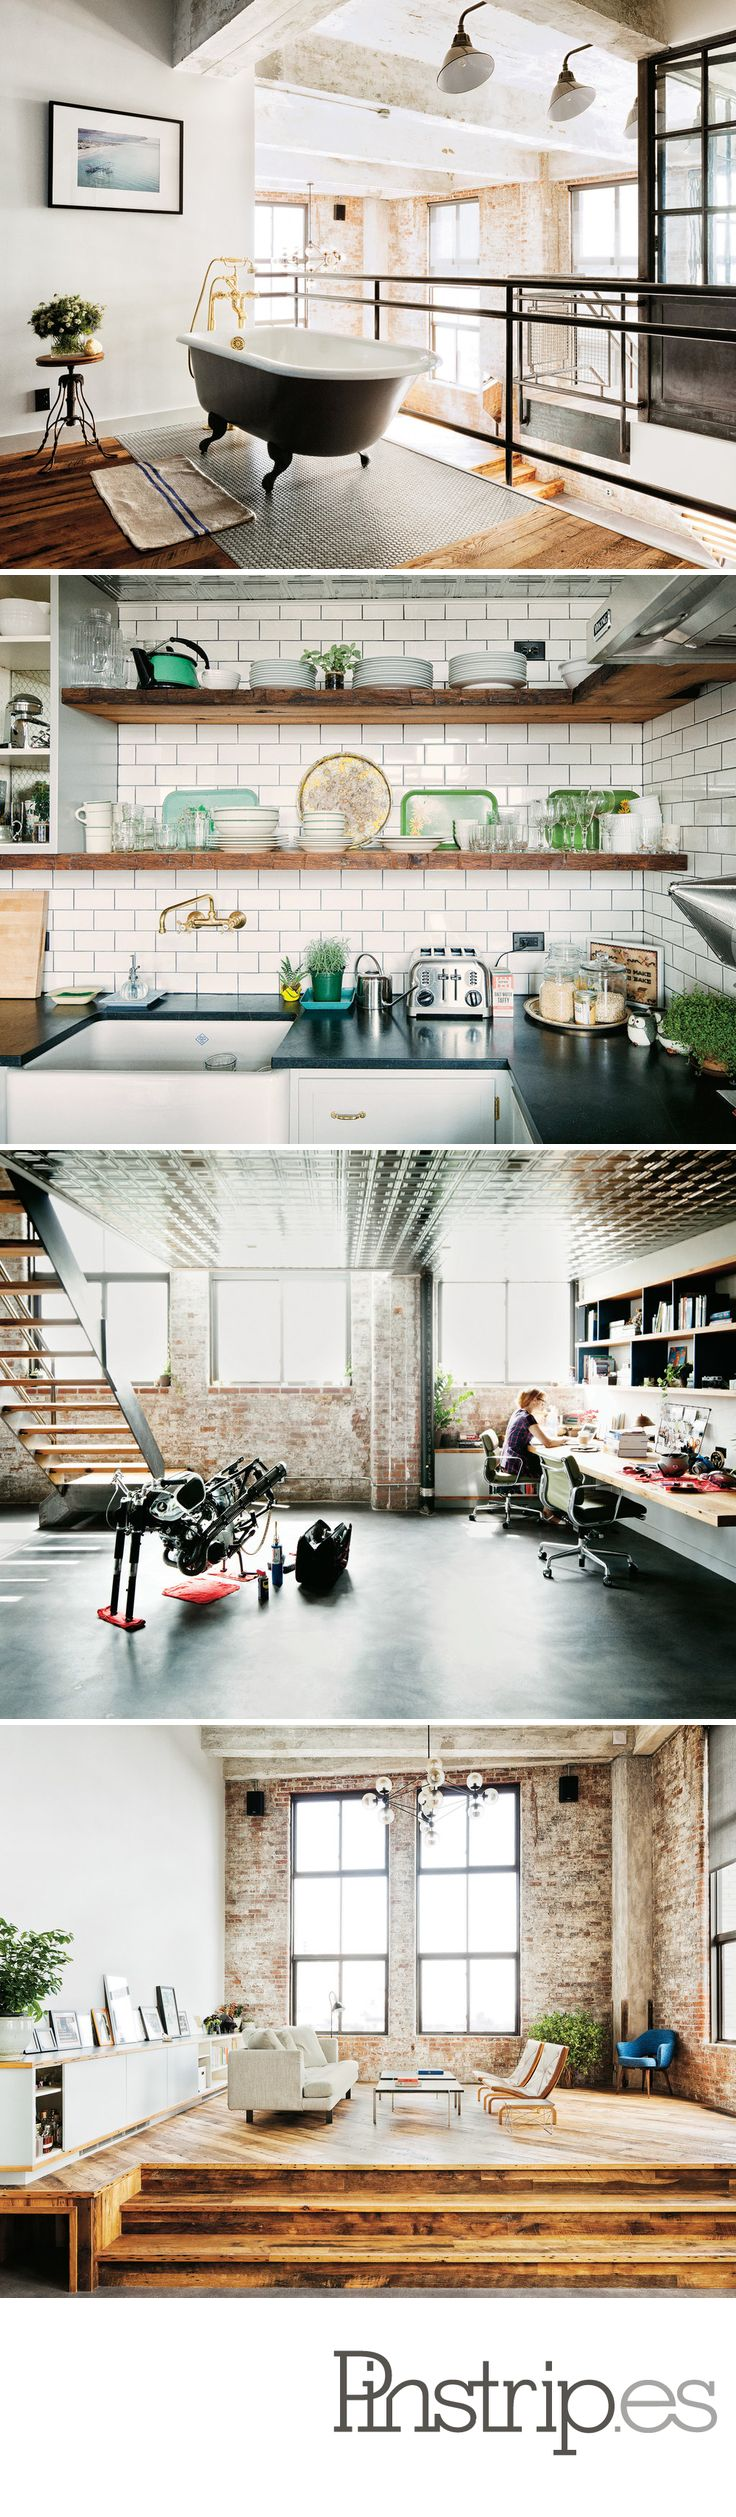 Decorating with Yahoo! money - Tumblr's David Karp's New Williamsburg Loft